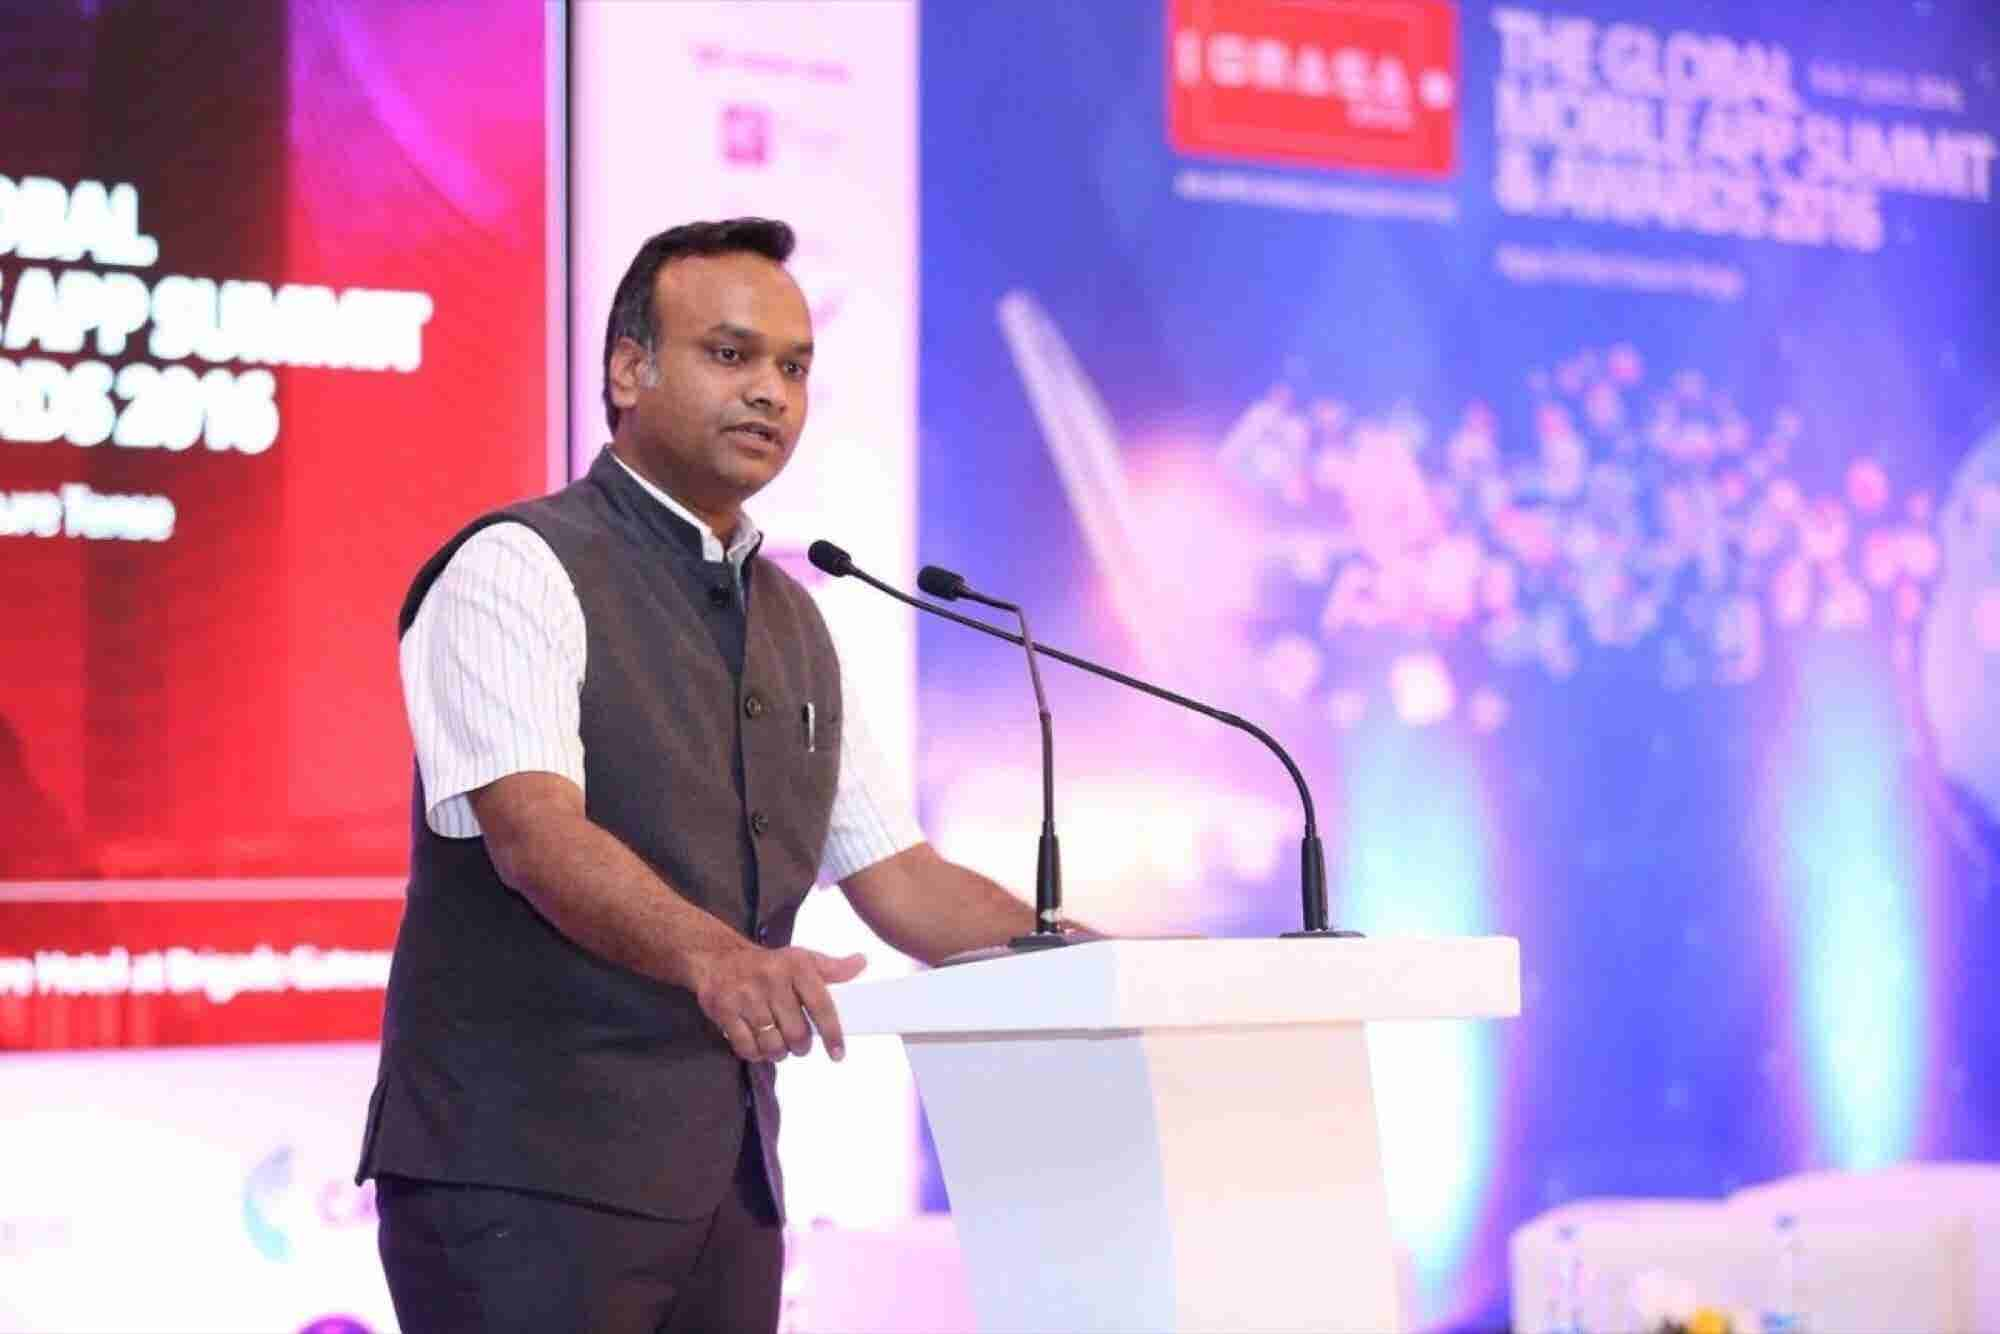 """We Are Taking Innovation To All Over Karnataka"" – Priyank Kharge"